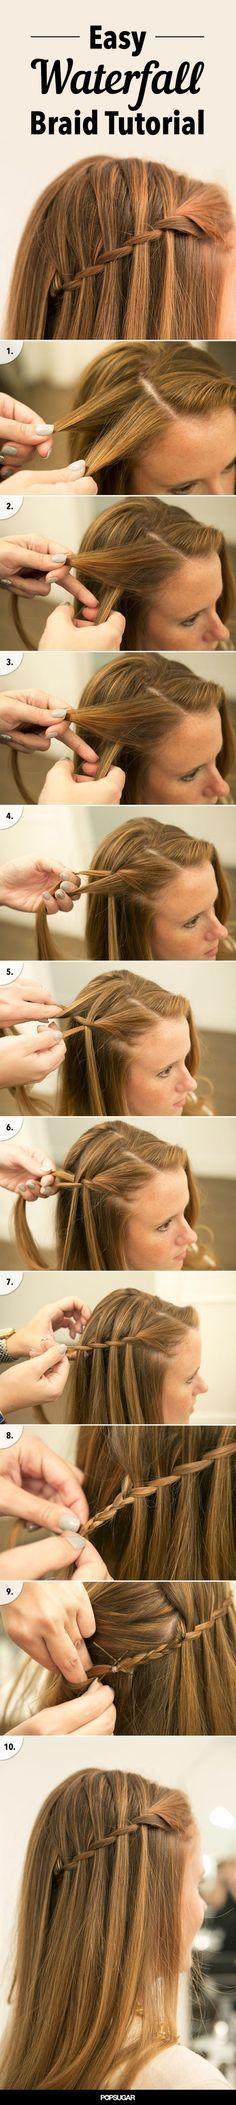 How to #DIY a waterfall braid. #waterfallbraid #braid by gloriaU